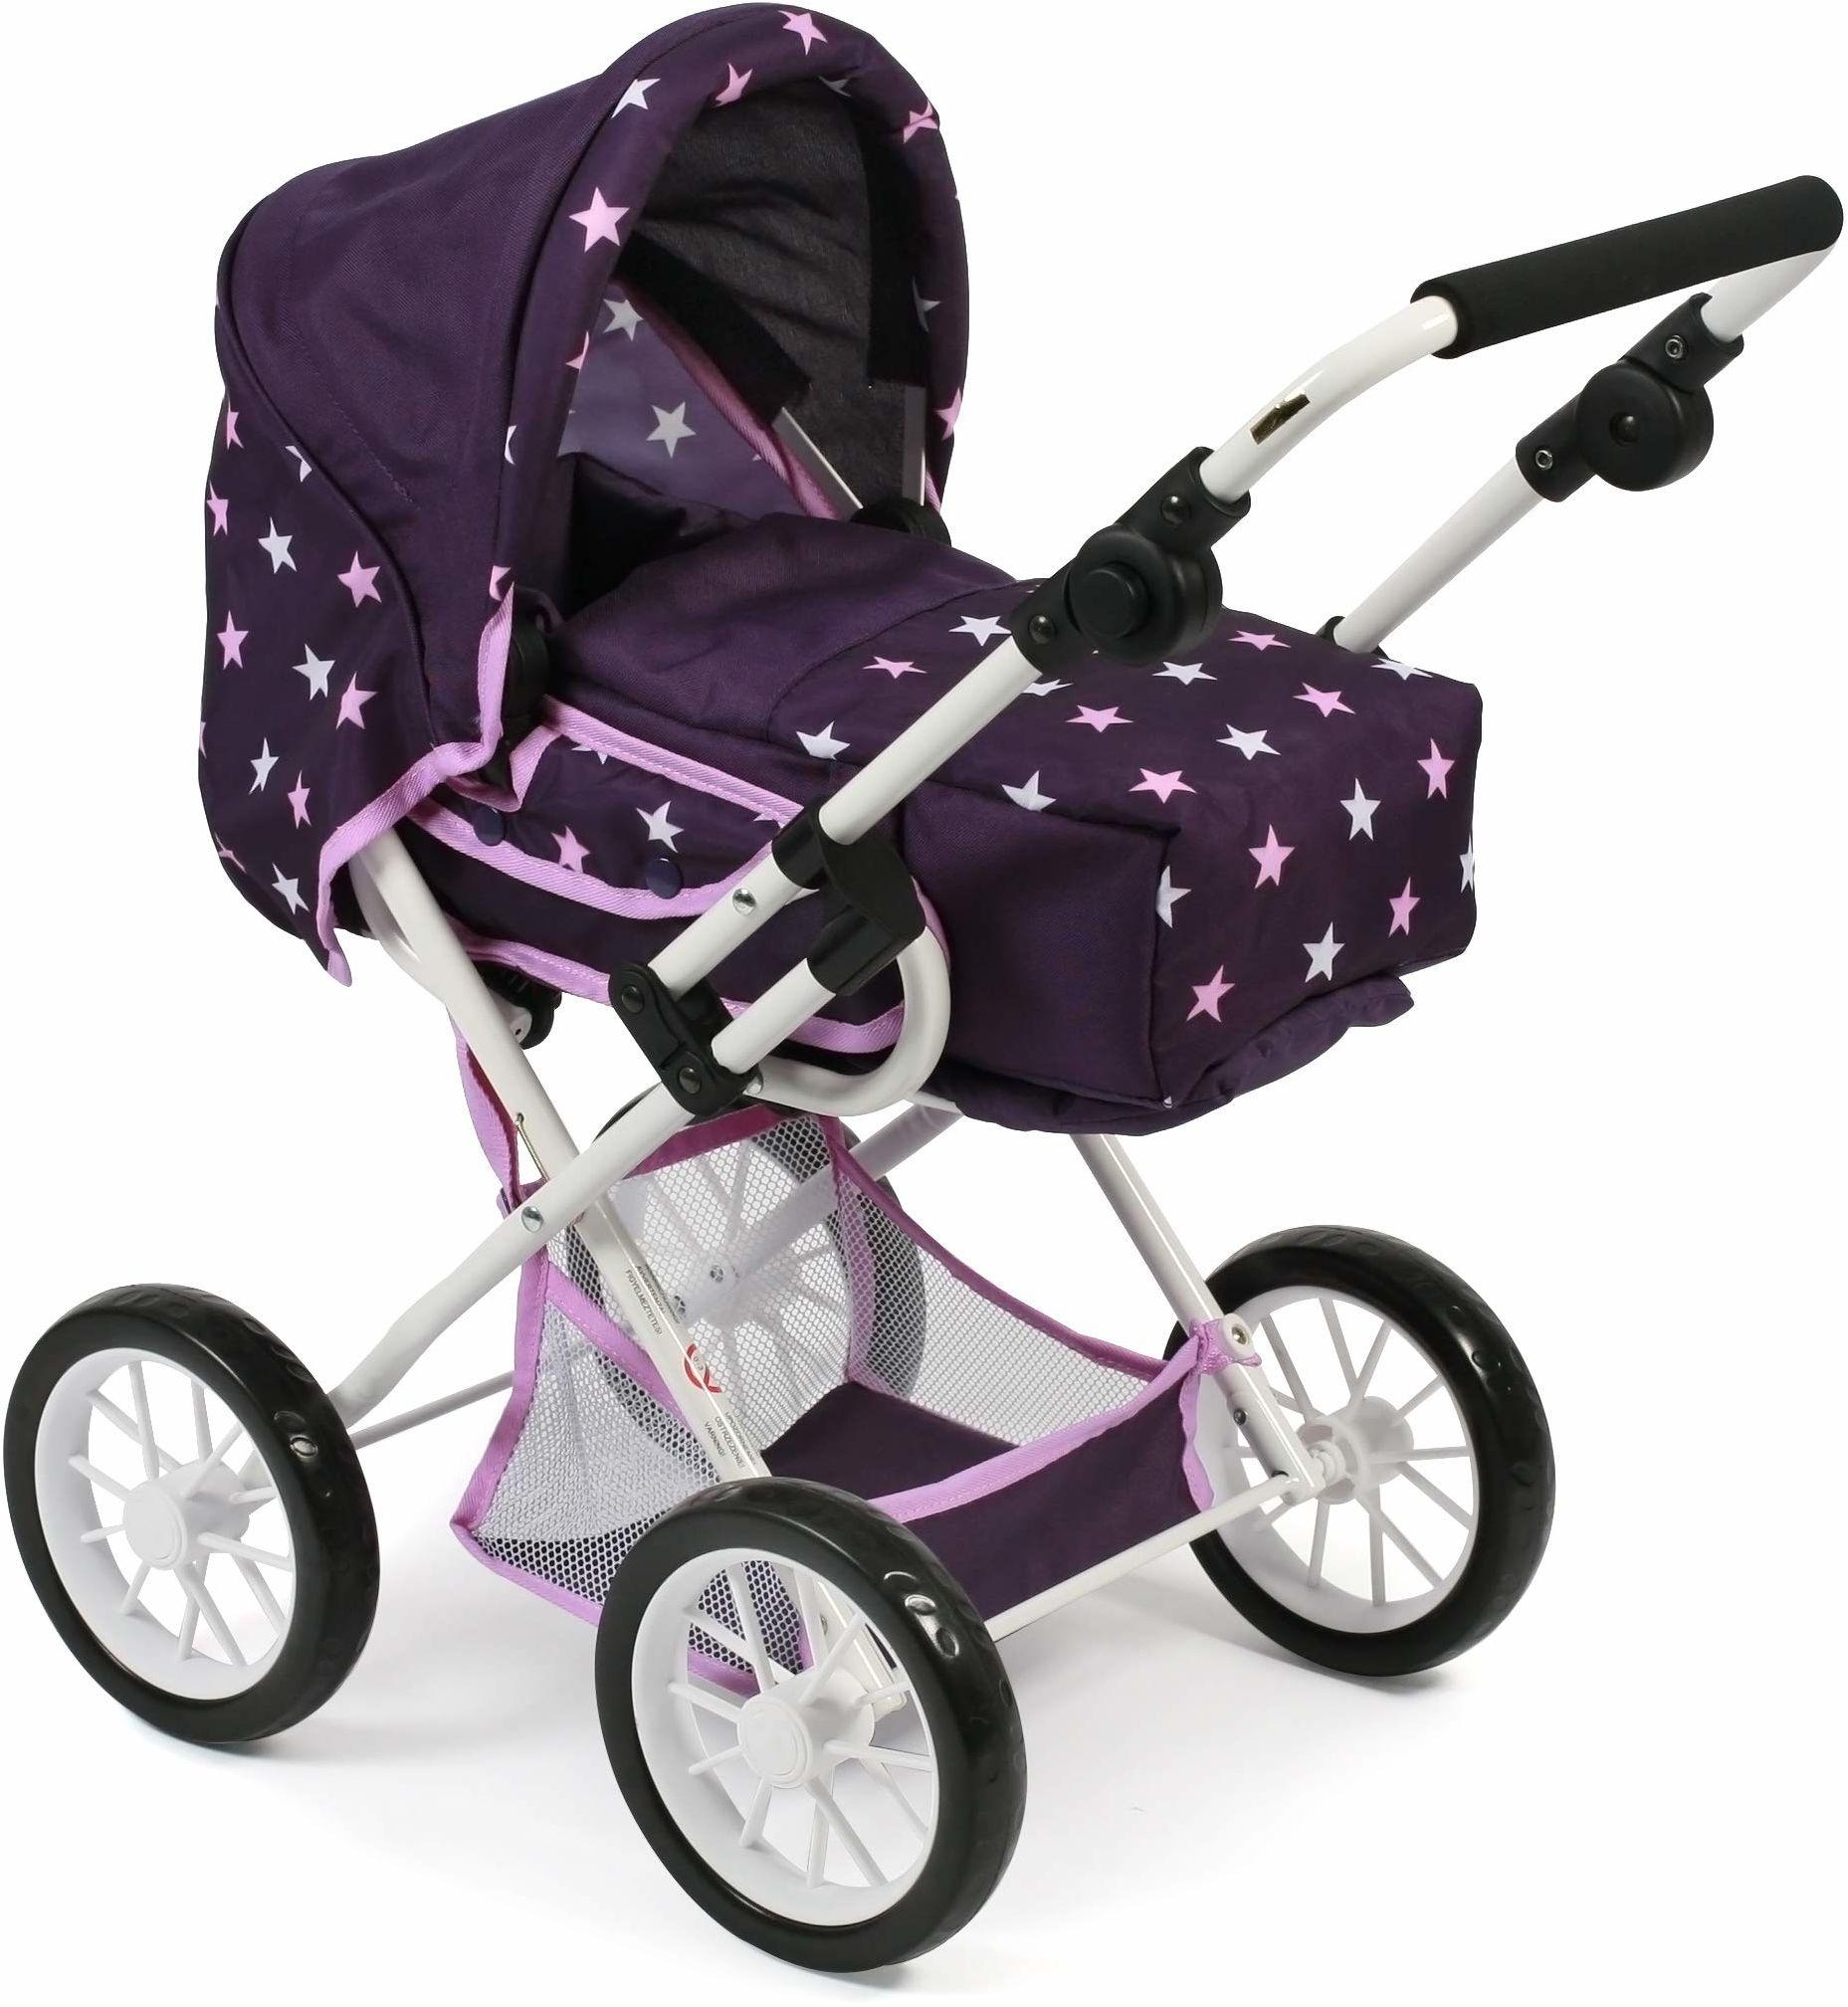 Bayer Chic 2000 560 71 wózek dla lalek kombi Leni, Stars liliowy